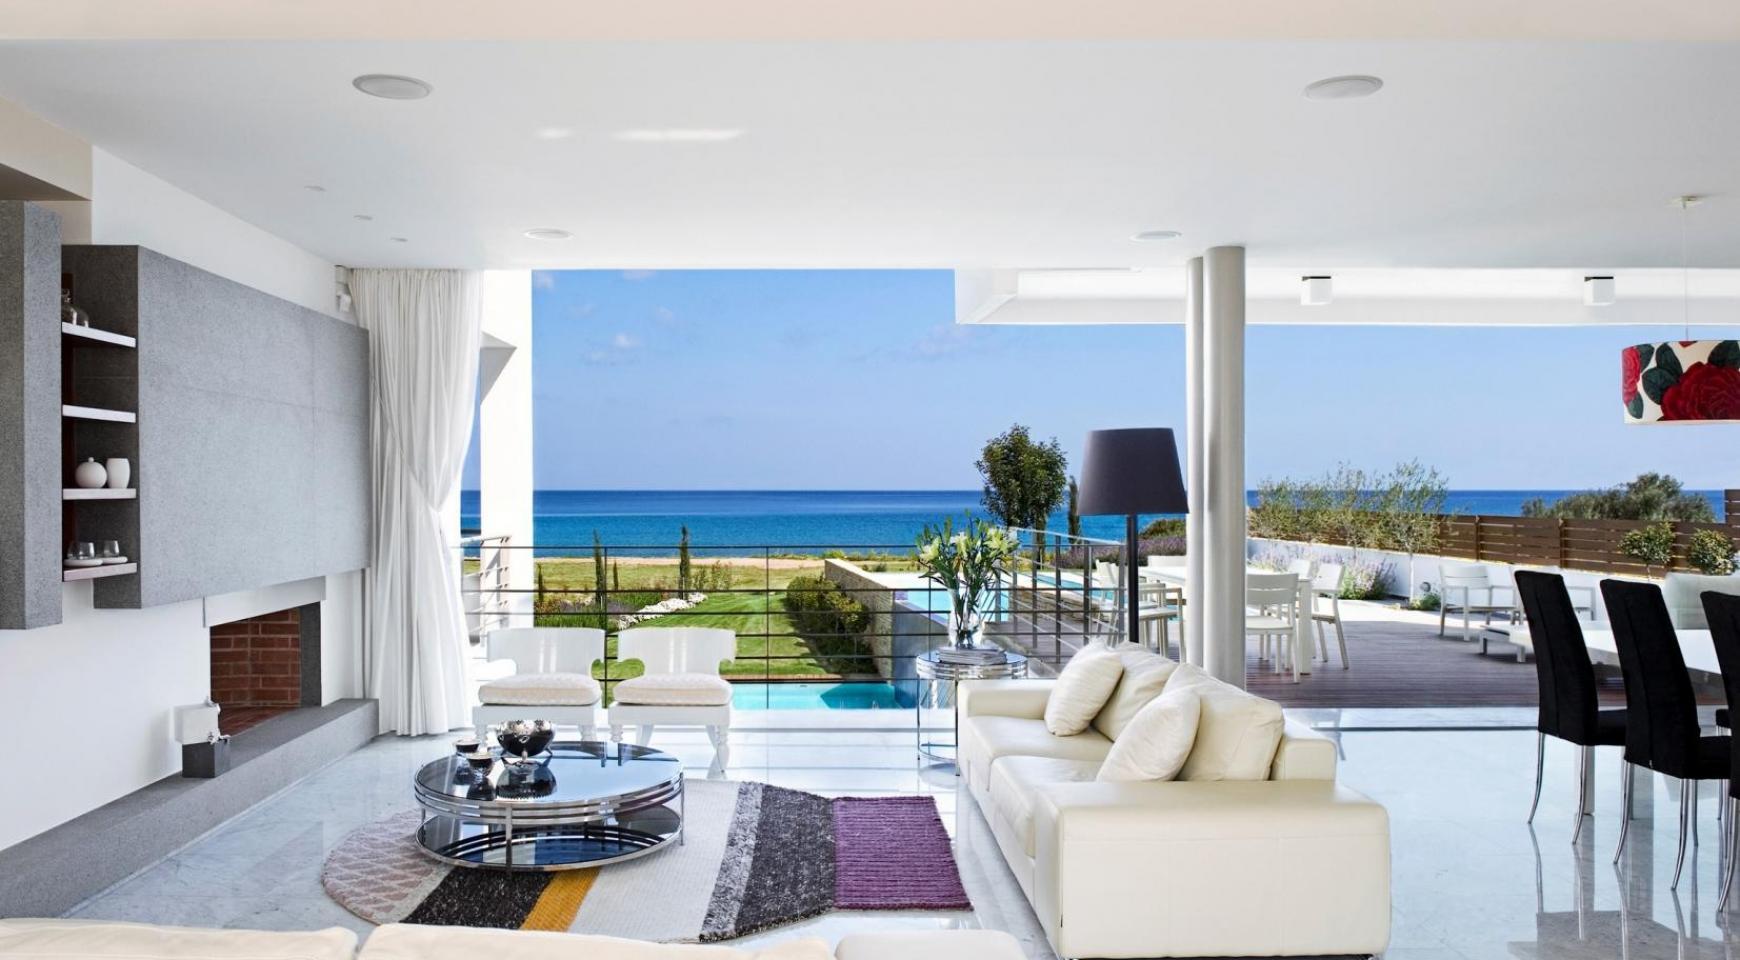 4 Bedroom Villa with Sea Views near Latsi - 4